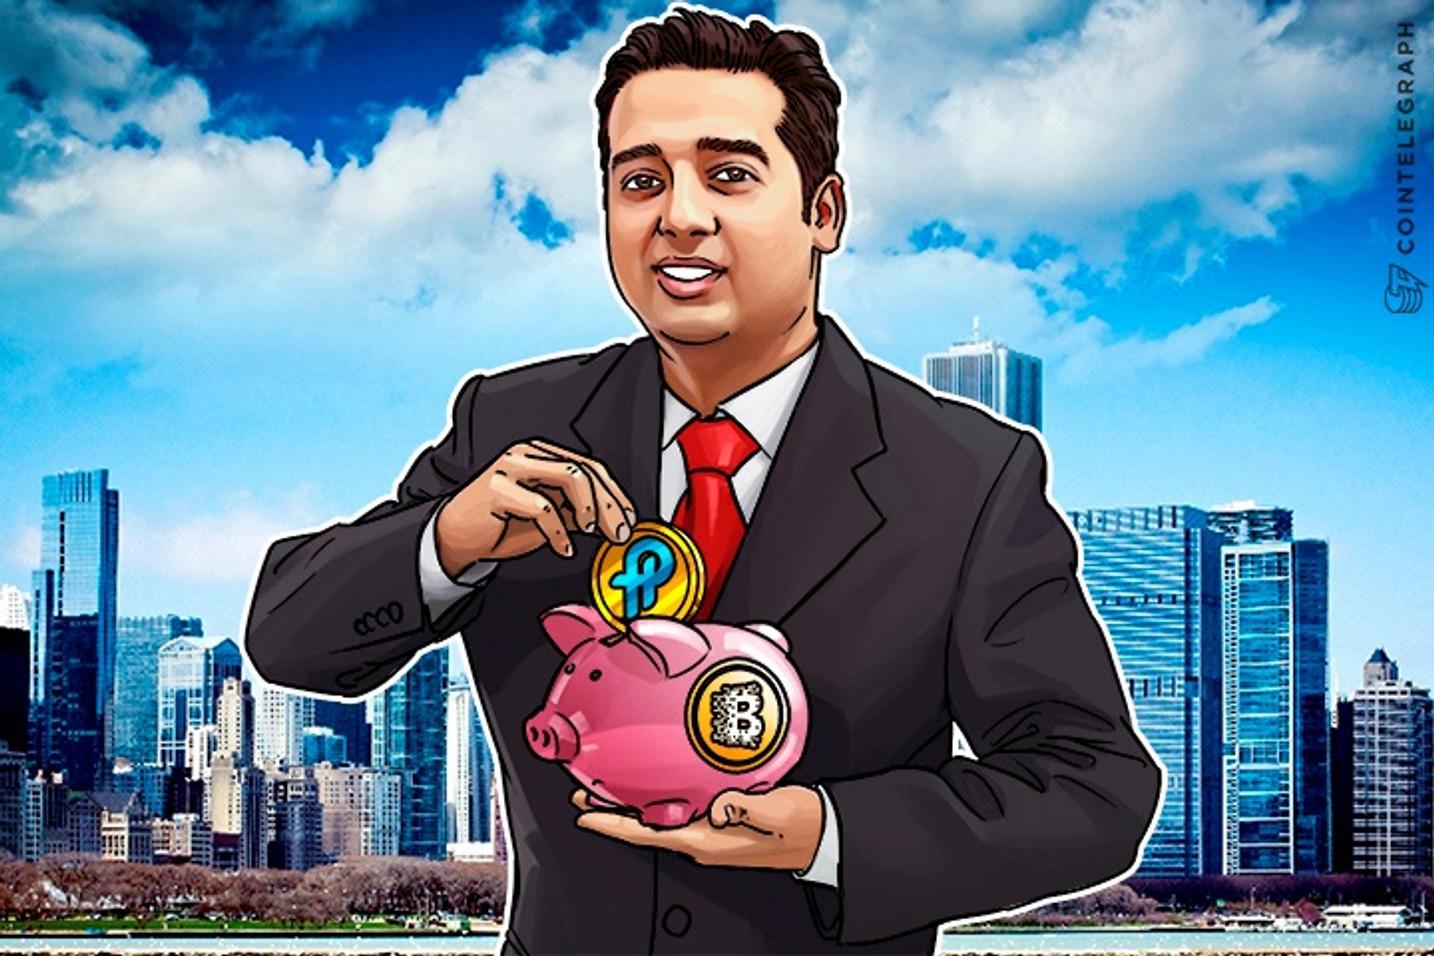 Indian Mining Company Becomes Sponsor of Botswana Blockchain and Bitcoin Summit